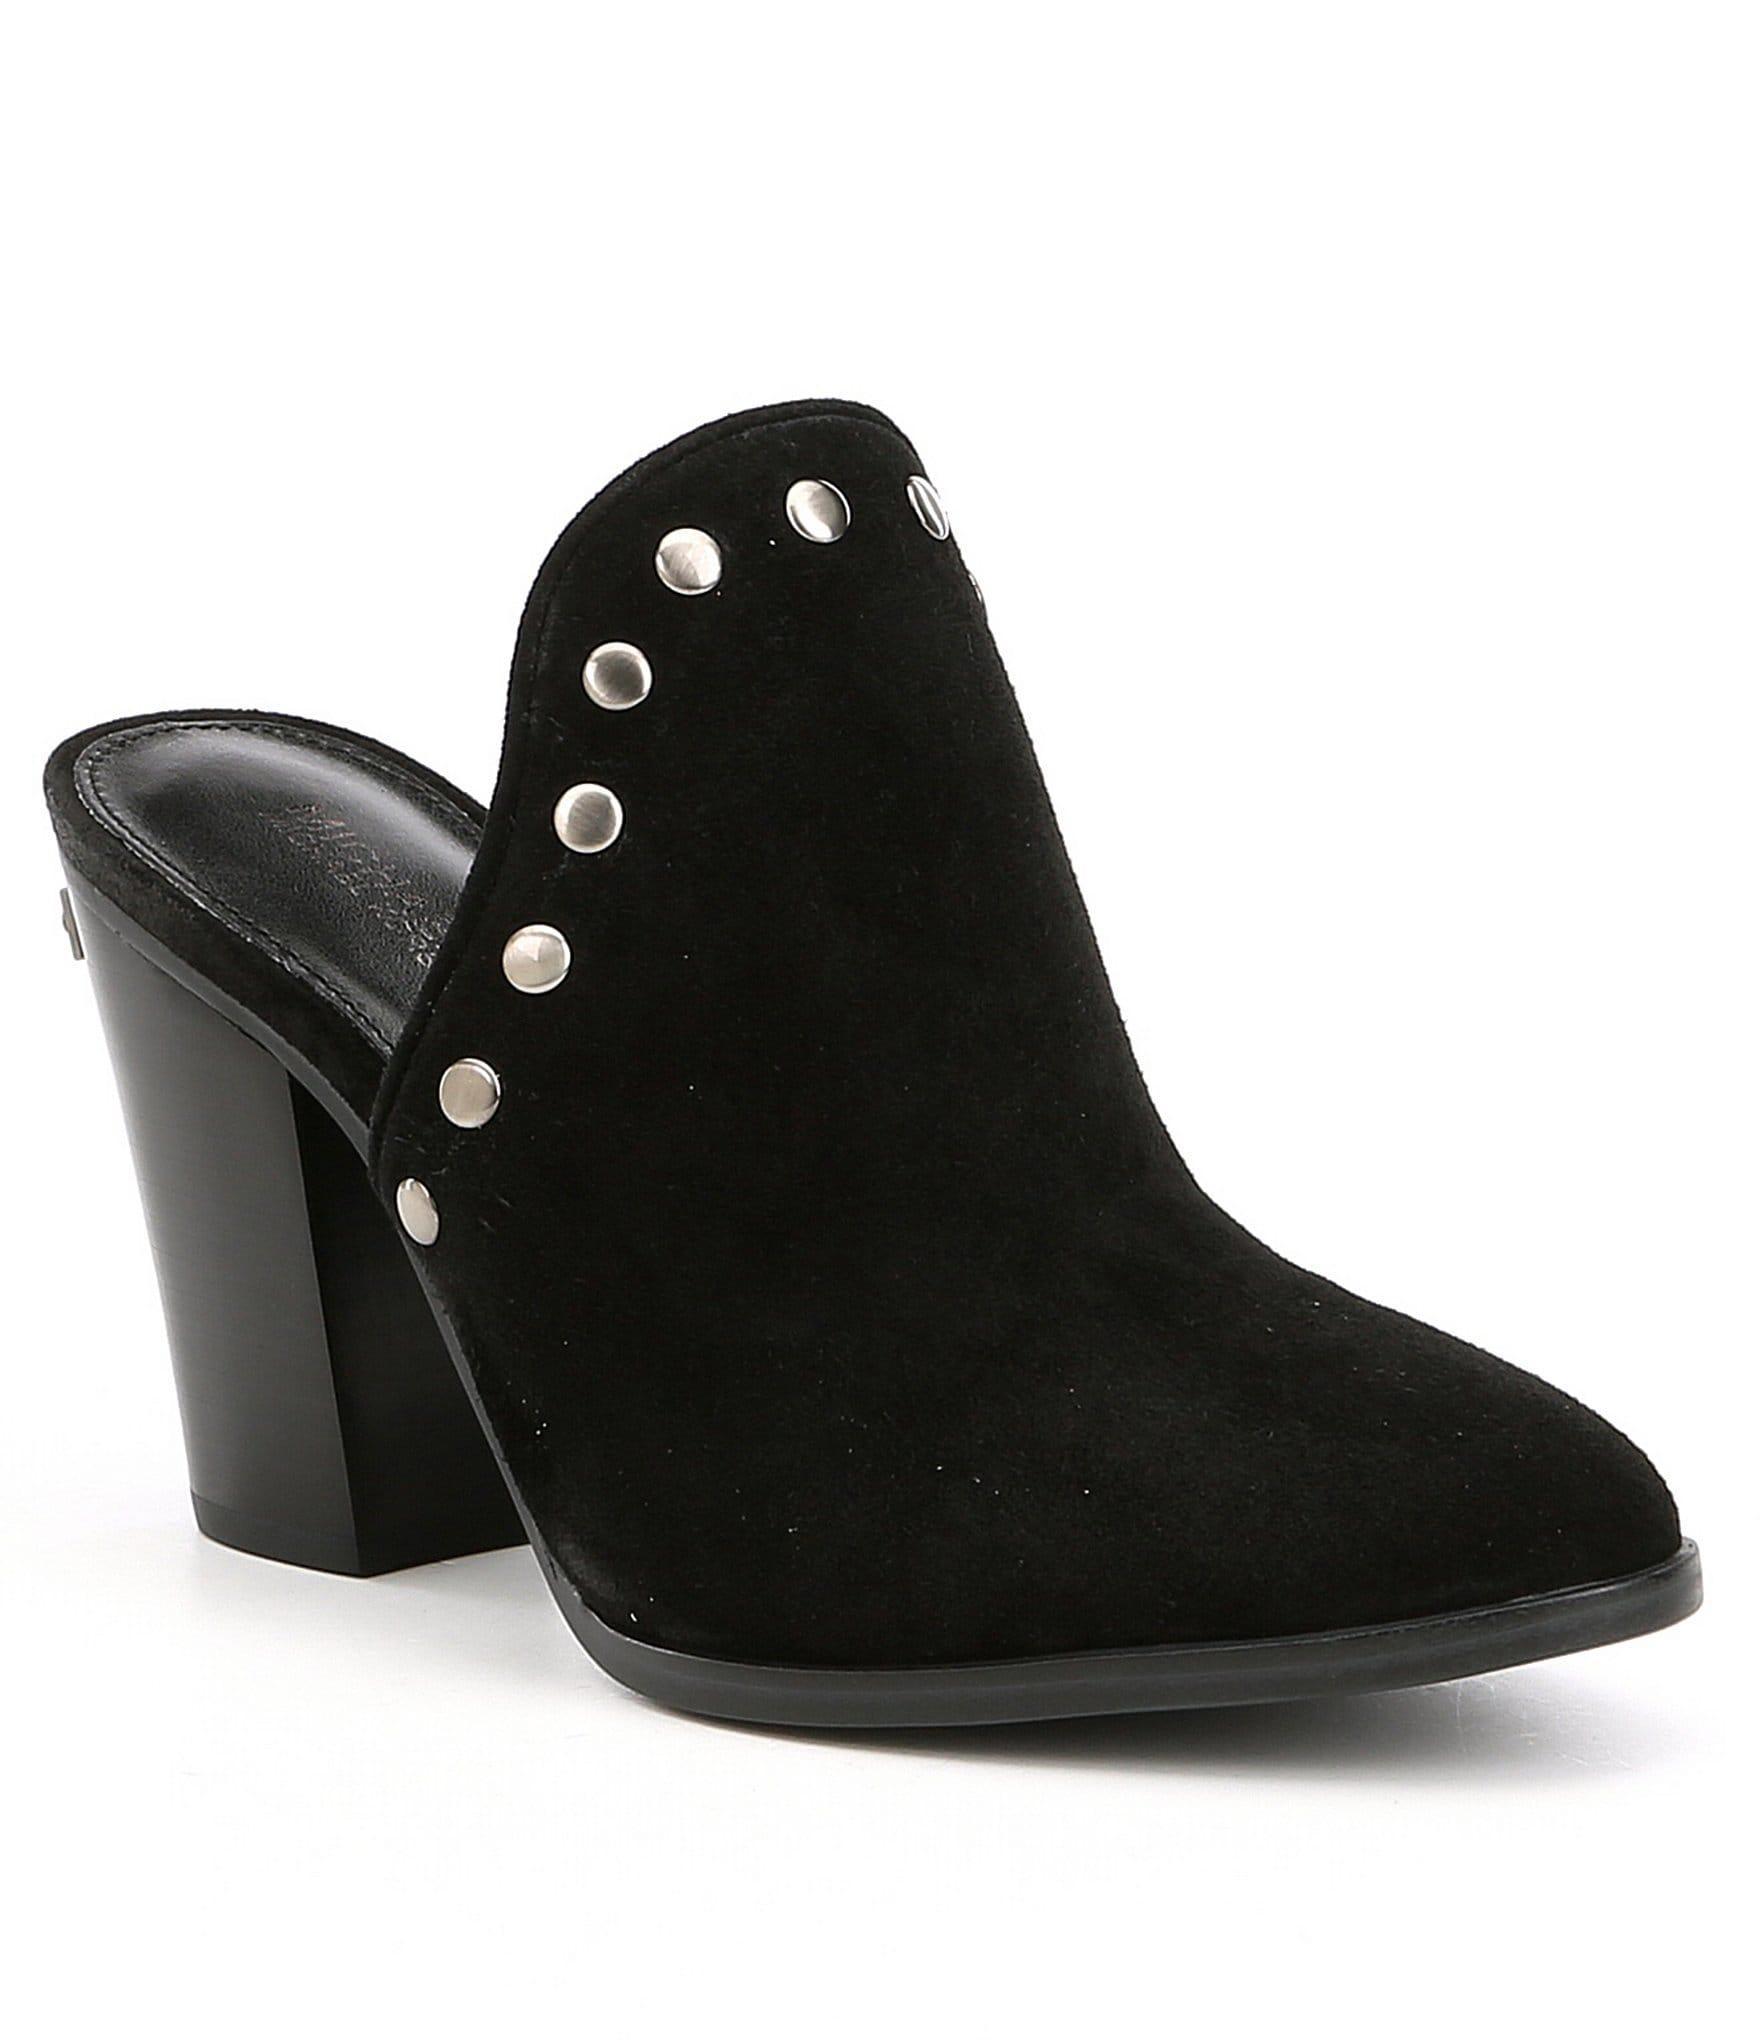 Michael Kors Black Studded Shoes